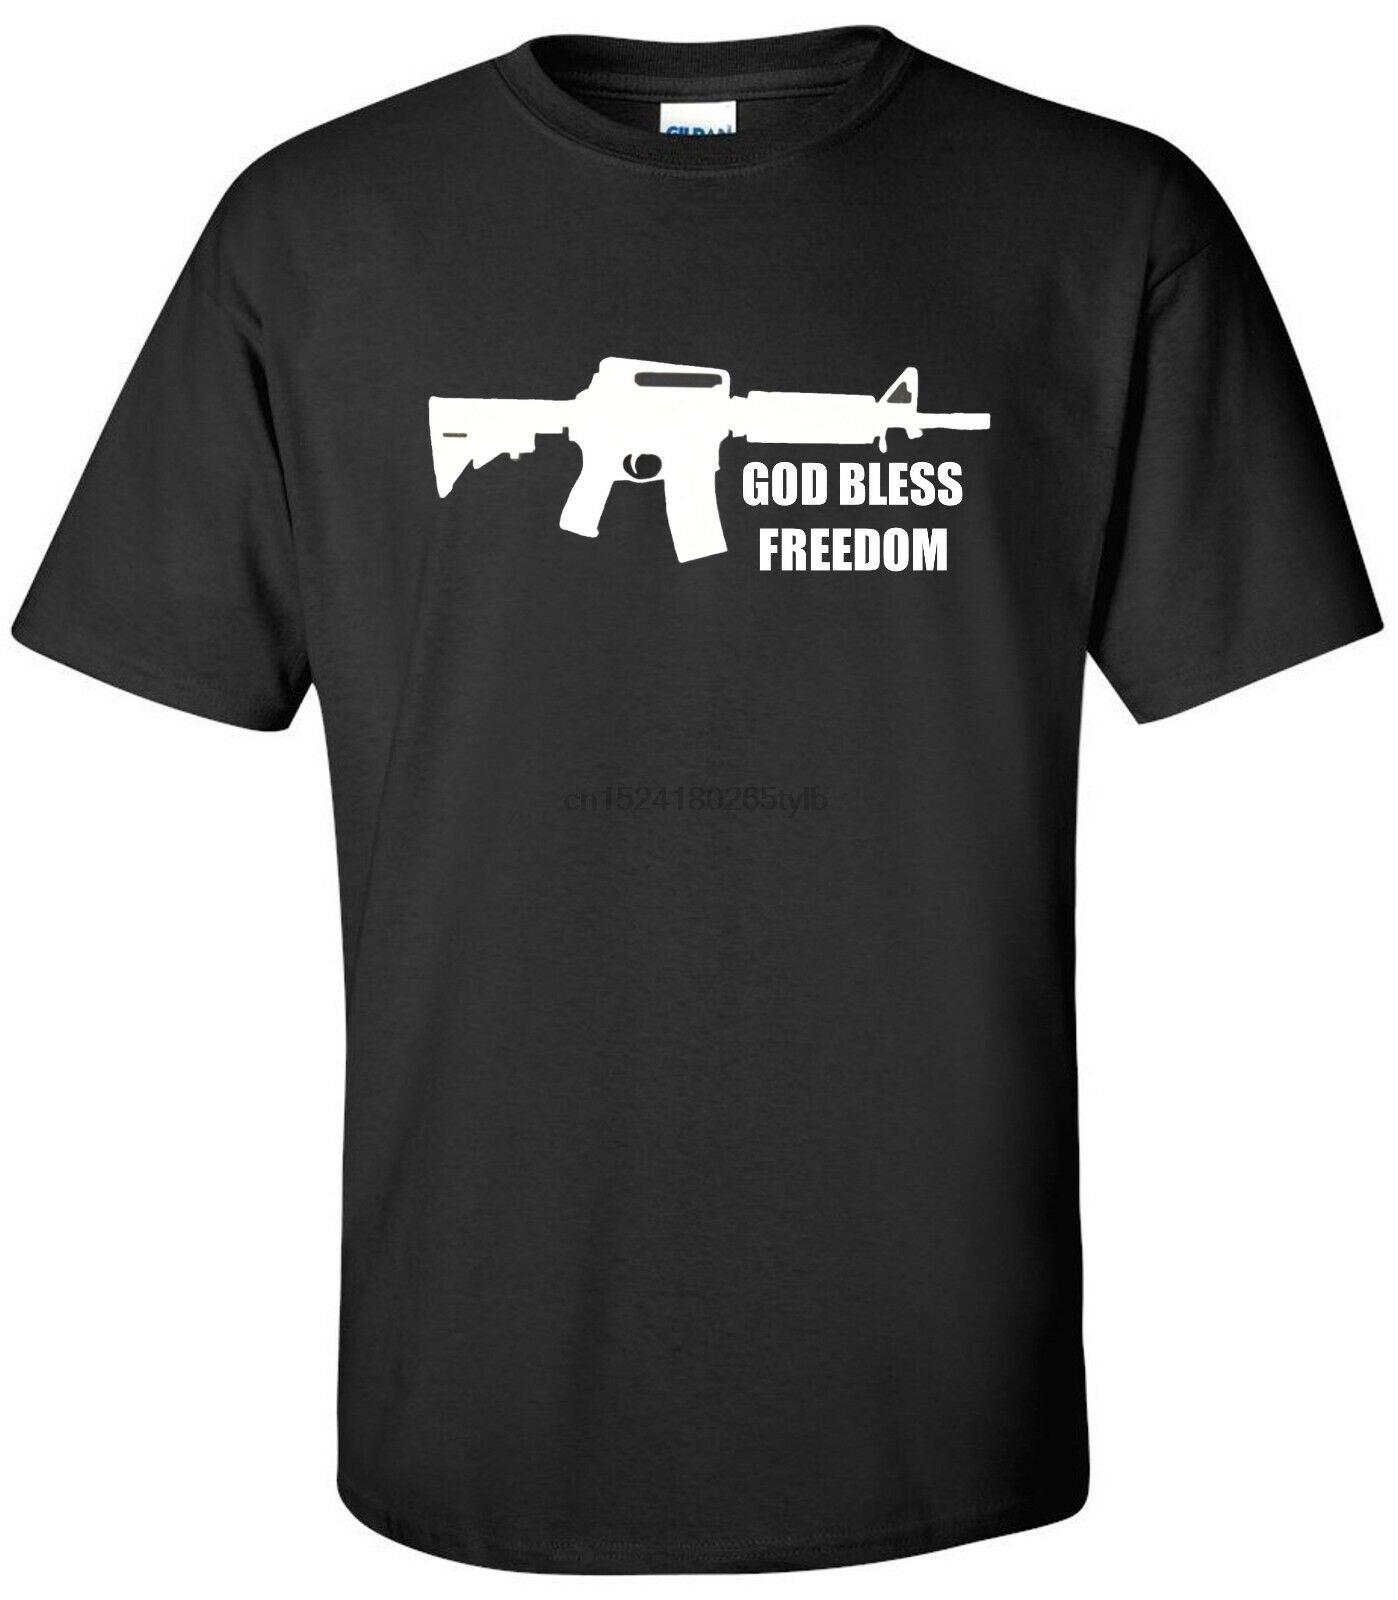 2nd Segunda Enmienda camiseta Ar-15 Ar15 Pro pistola Dios bendiga la libertad camisa S-2XL